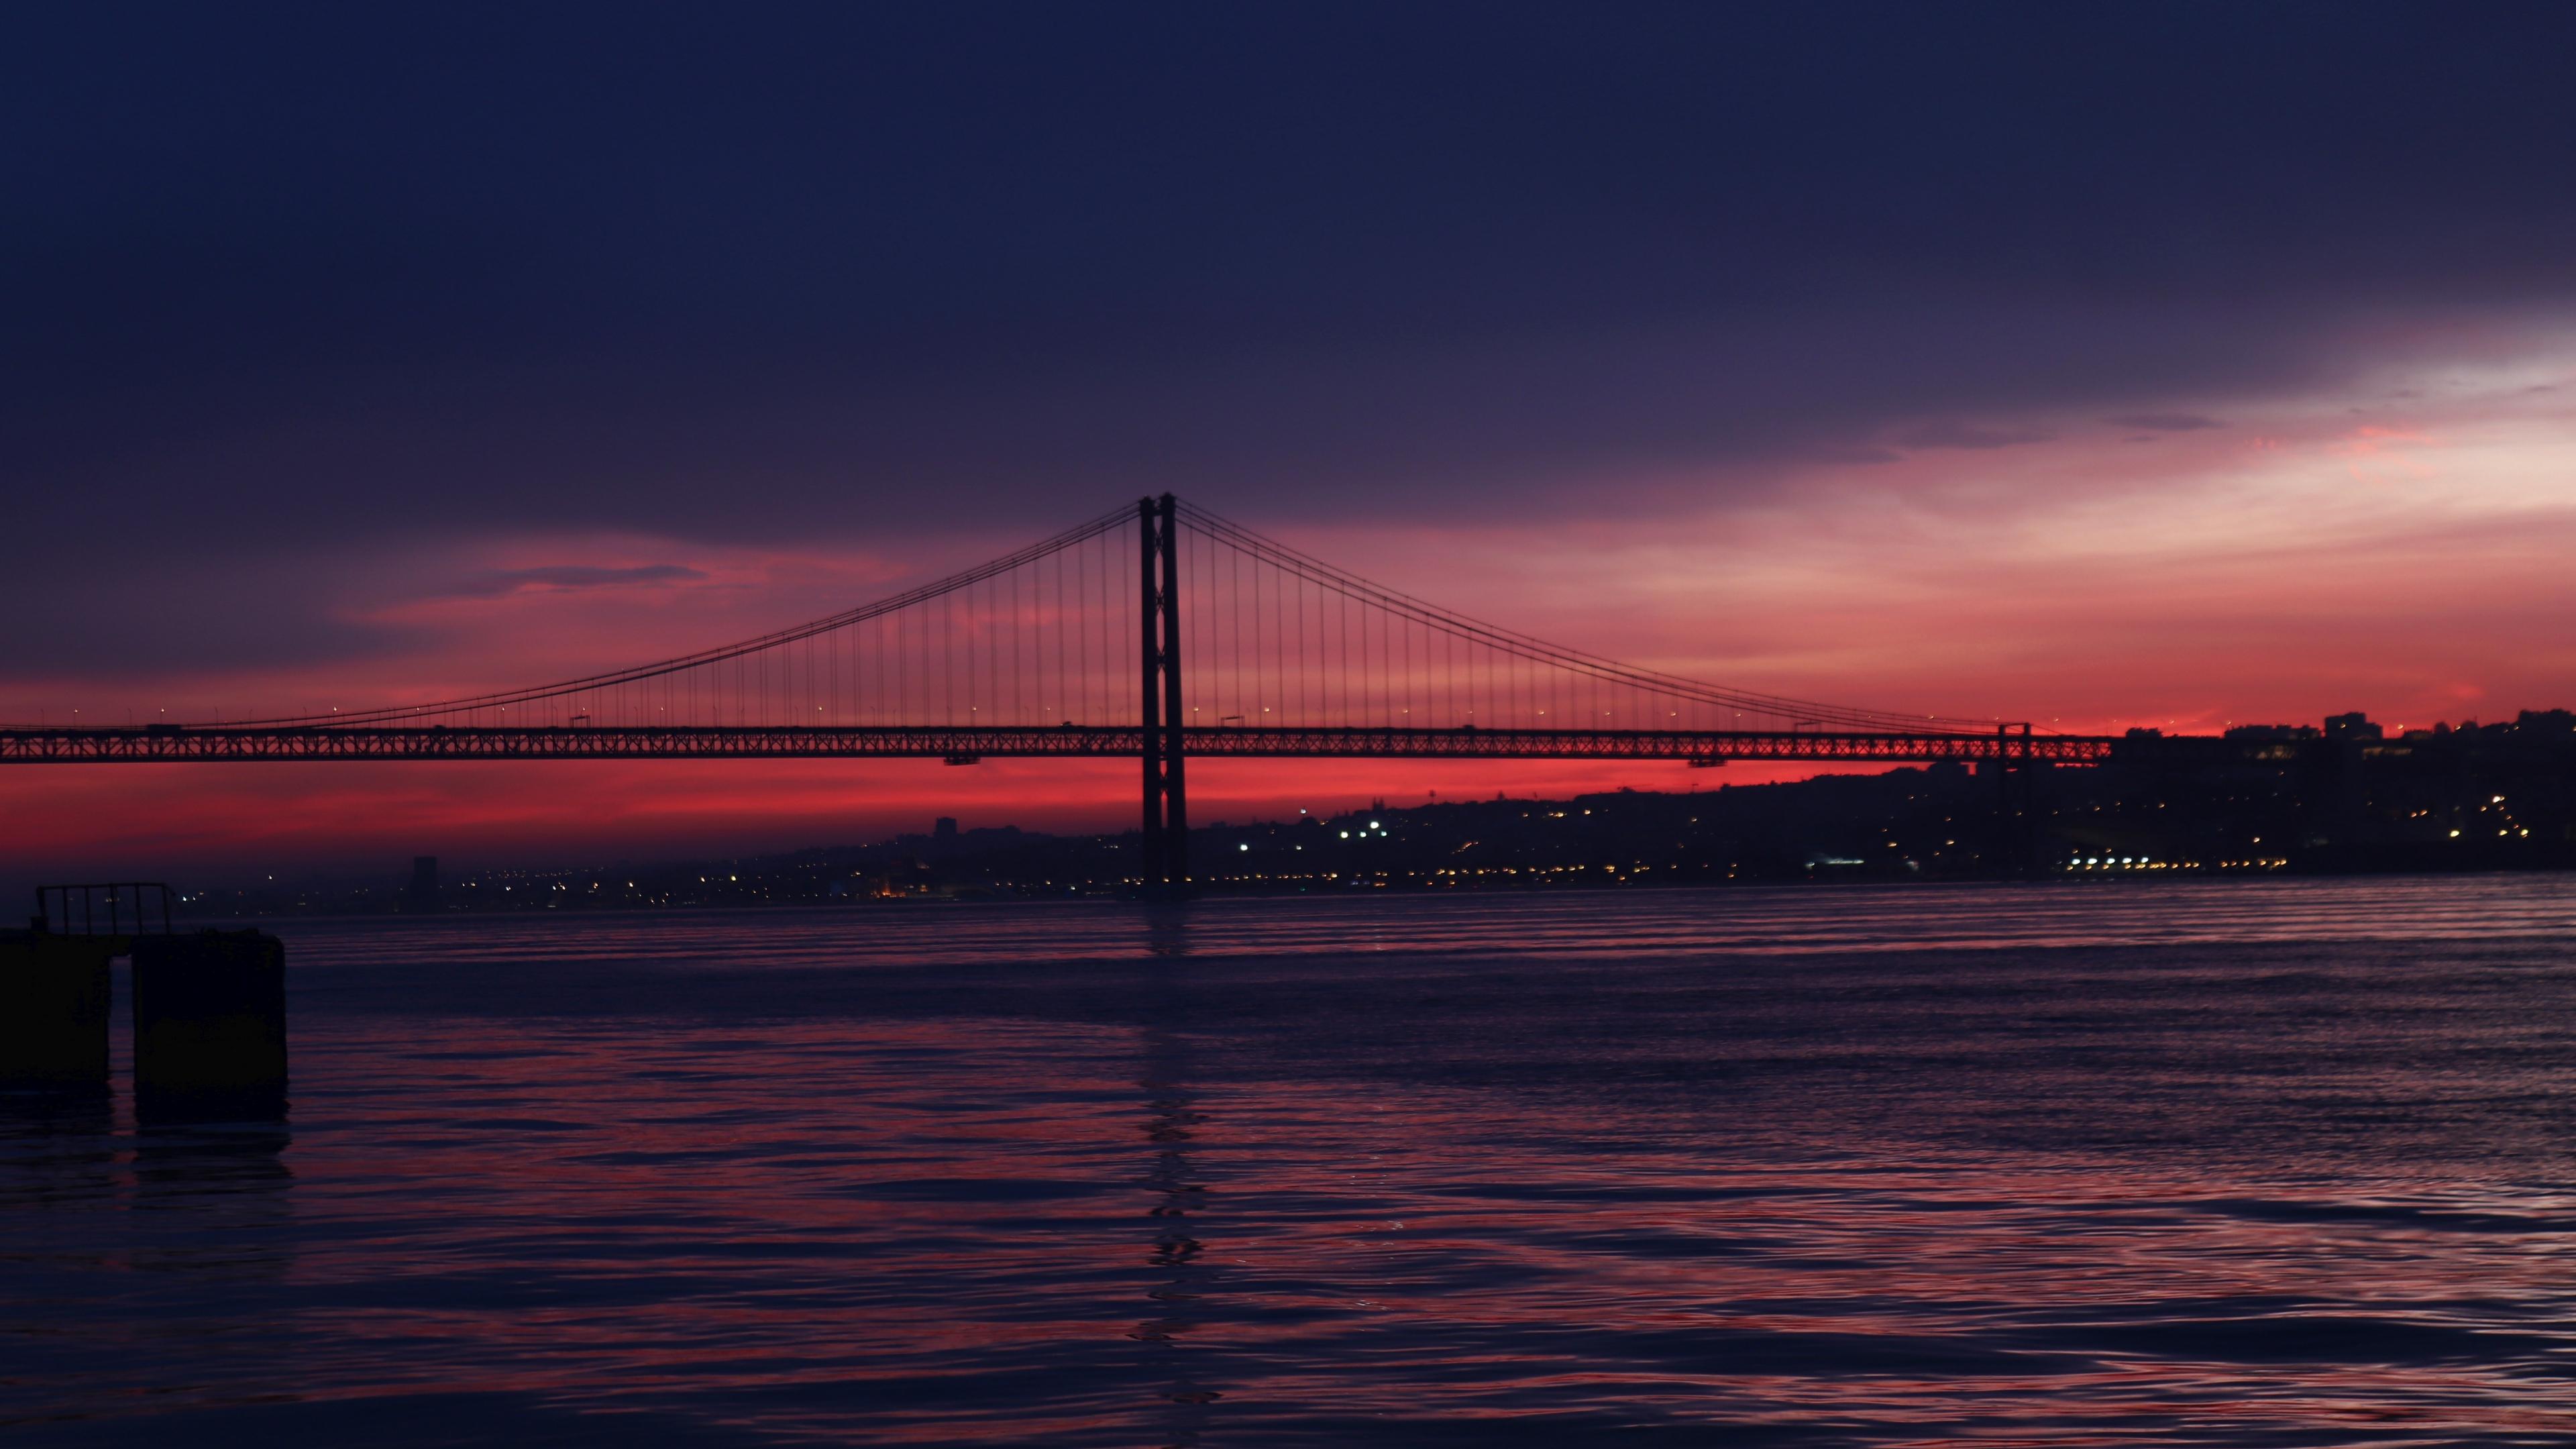 Download 3840x2160 Wallpaper San Franciscos Golden Gate